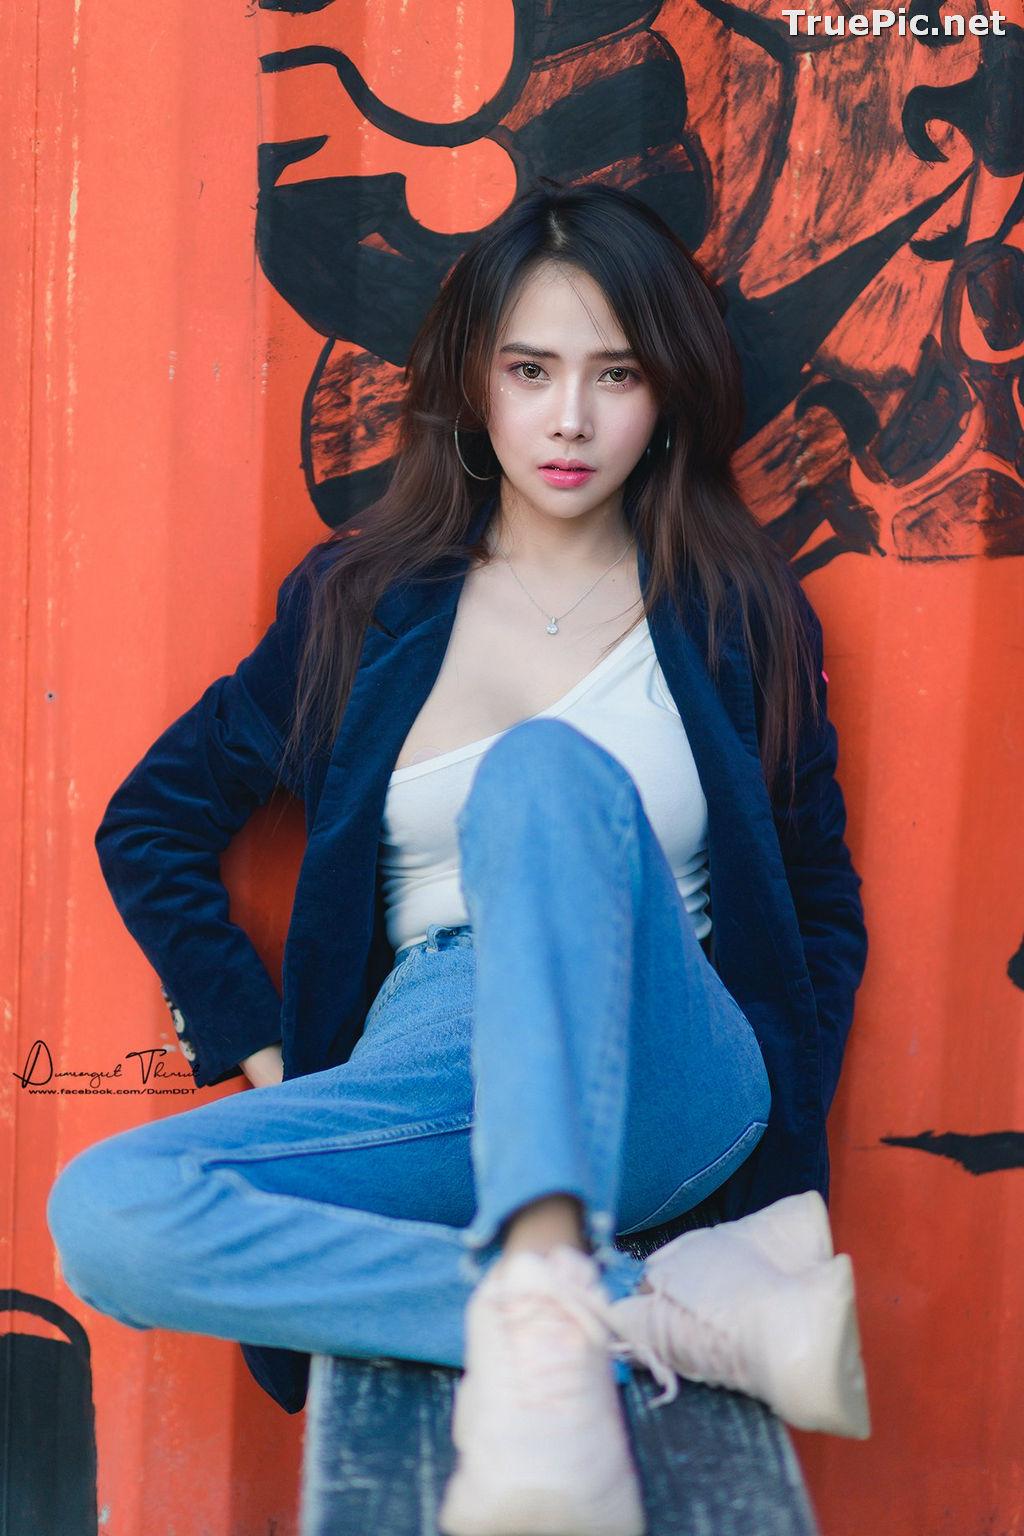 Image Thailand Model - Anusara Thaweesuk - Wild Grass Field - TruePic.net - Picture-7